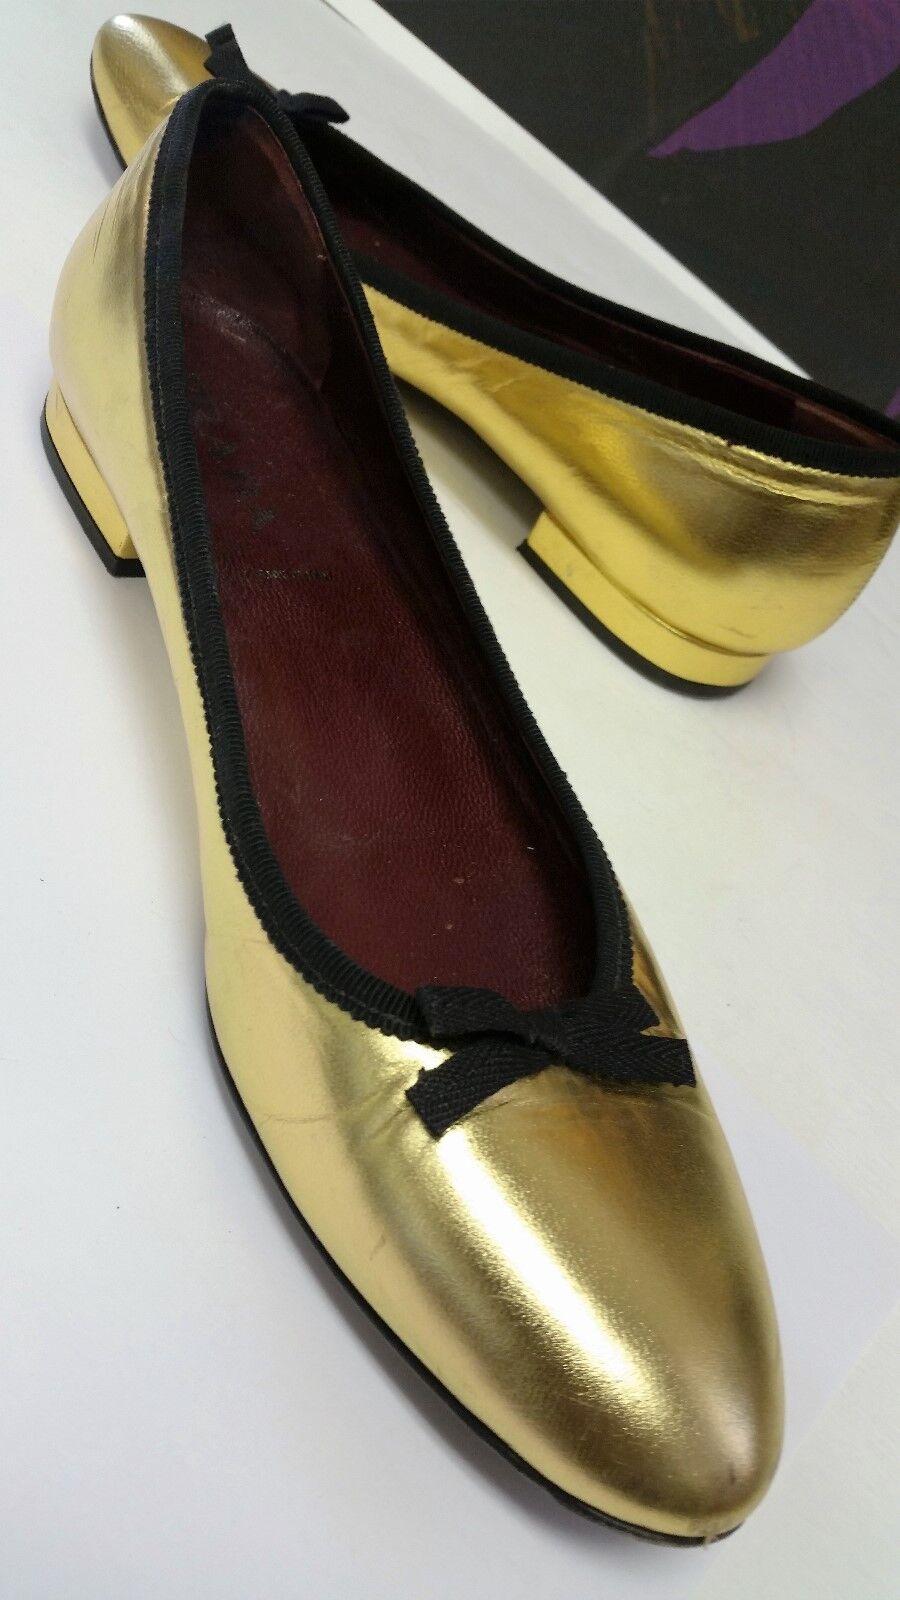 LANVIN EU Nero Leather Ballerinas, US 8 EU LANVIN 38 85c294